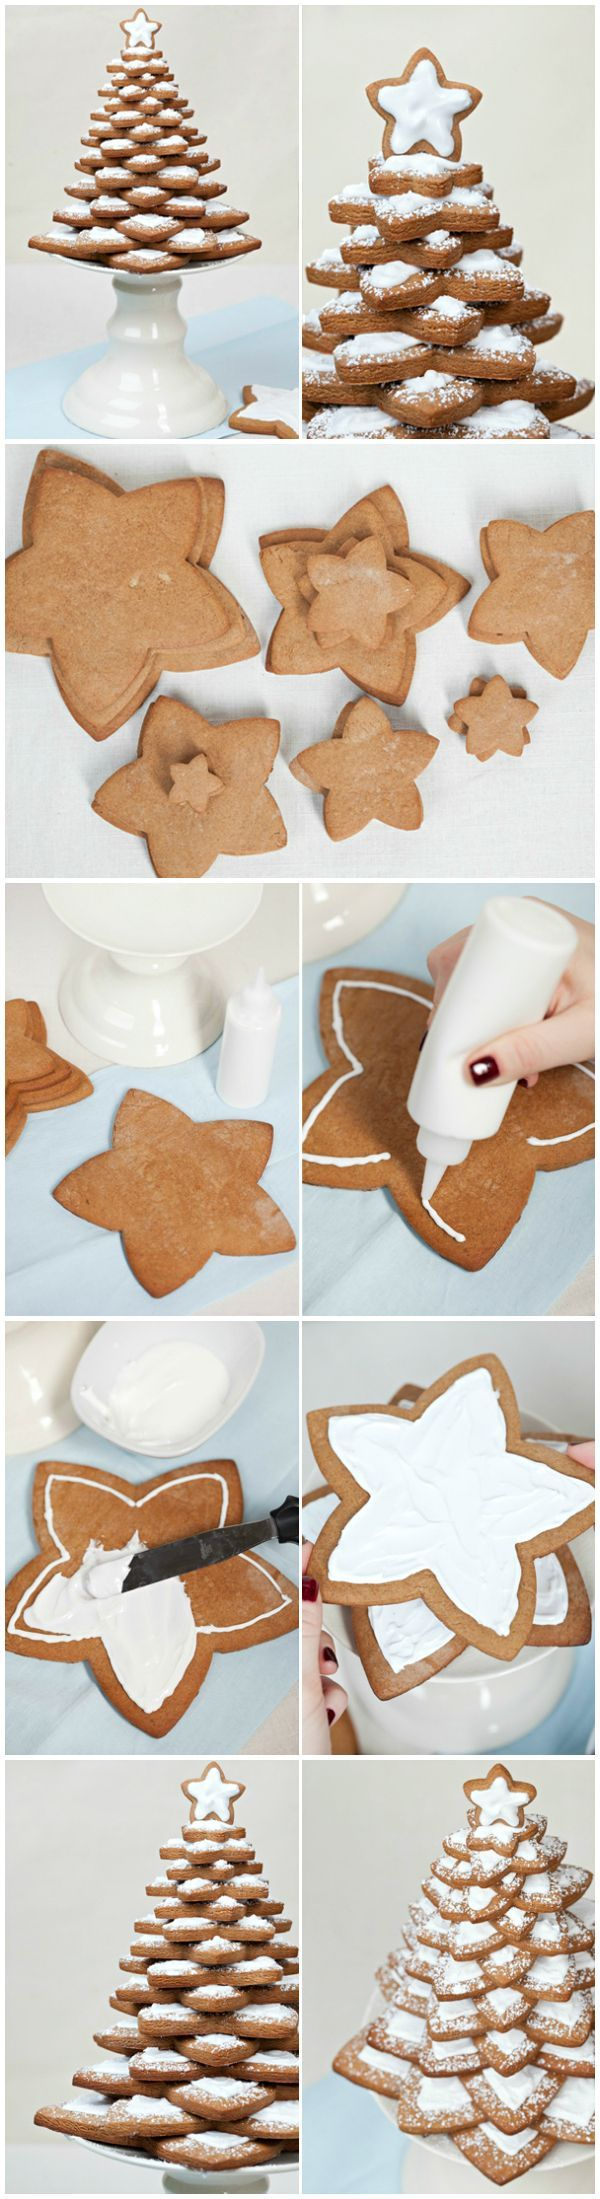 Recipe ● Tutorial ● Gingerbread Tree